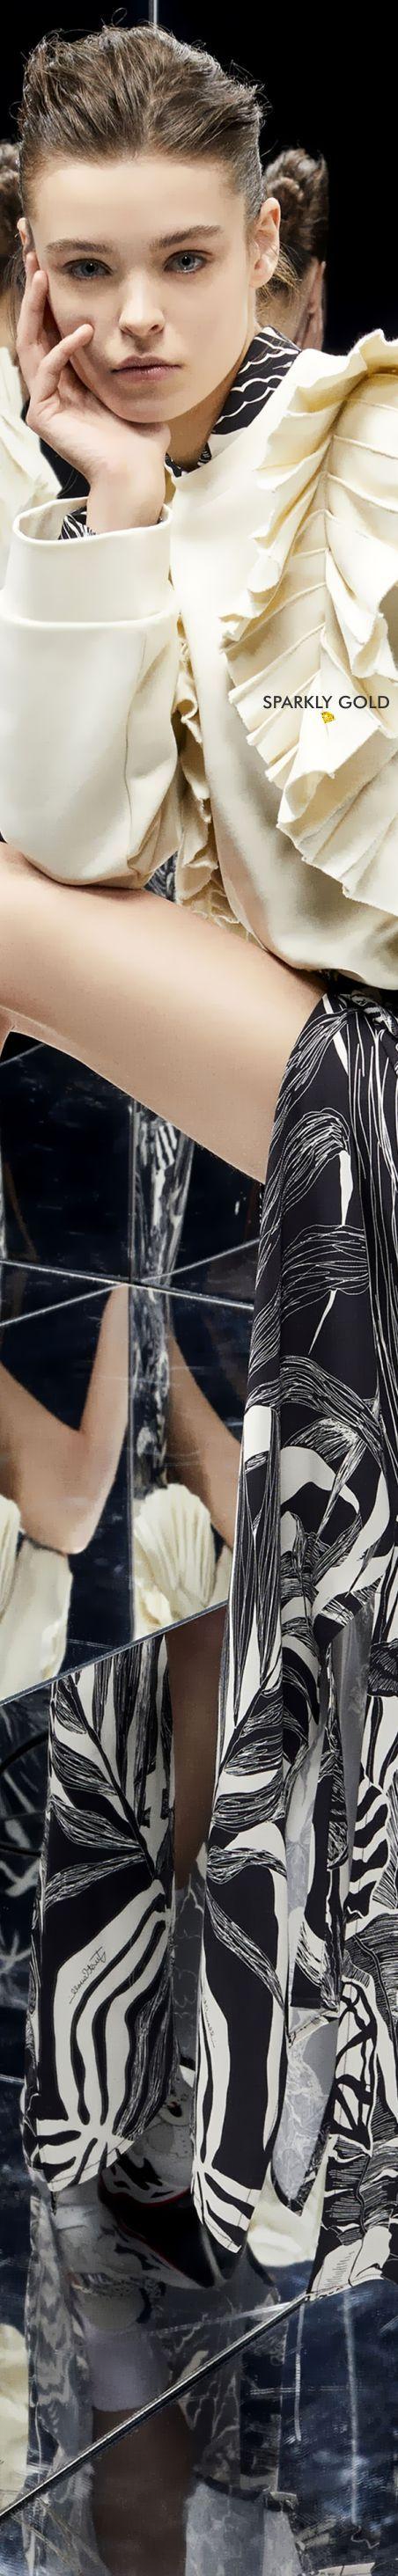 34e92eac8c4339b633738b7a15c9331b Collection Roberto Cavalli et Just Cavali  : Just Cavalli Automne 2019 RTW | Or brillant: